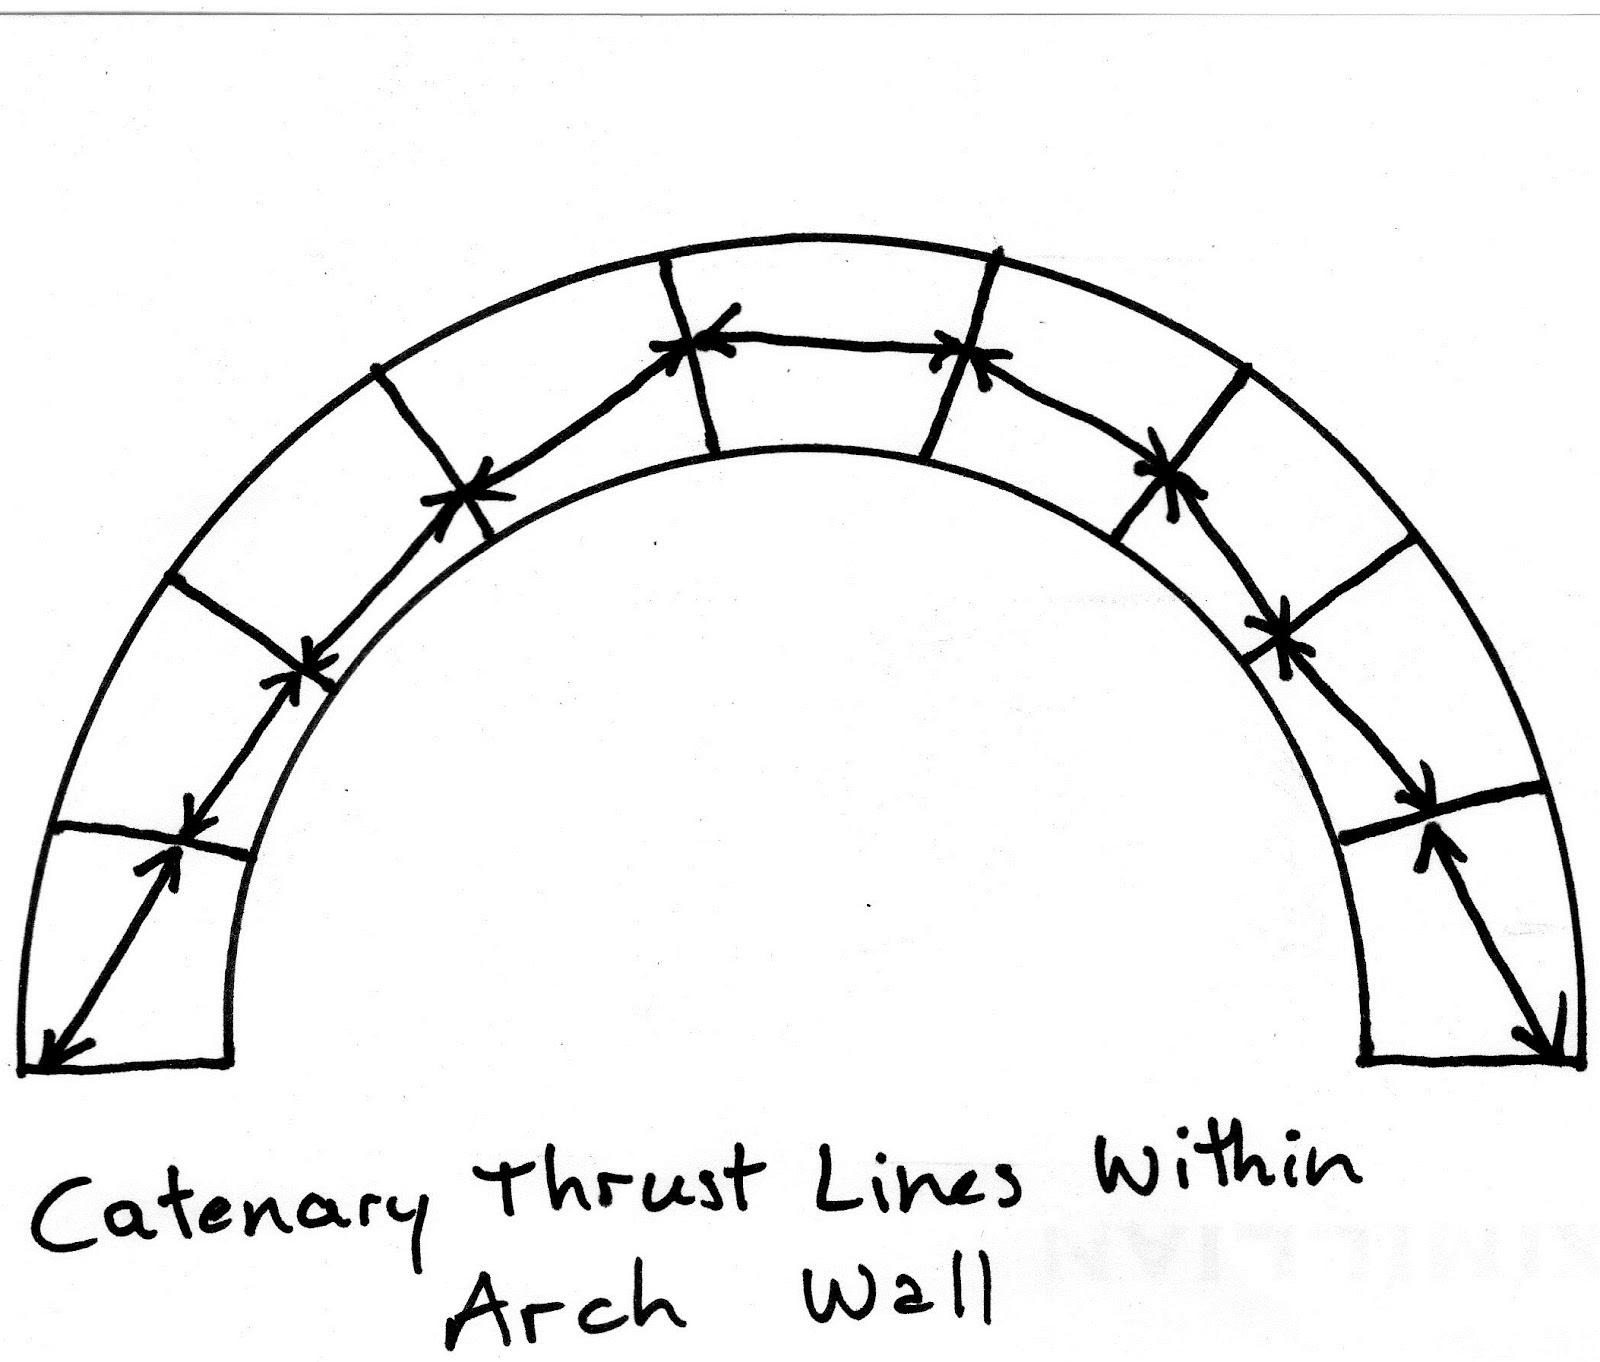 Masonry Design Corrugations And Ribs In A Masonry Arch